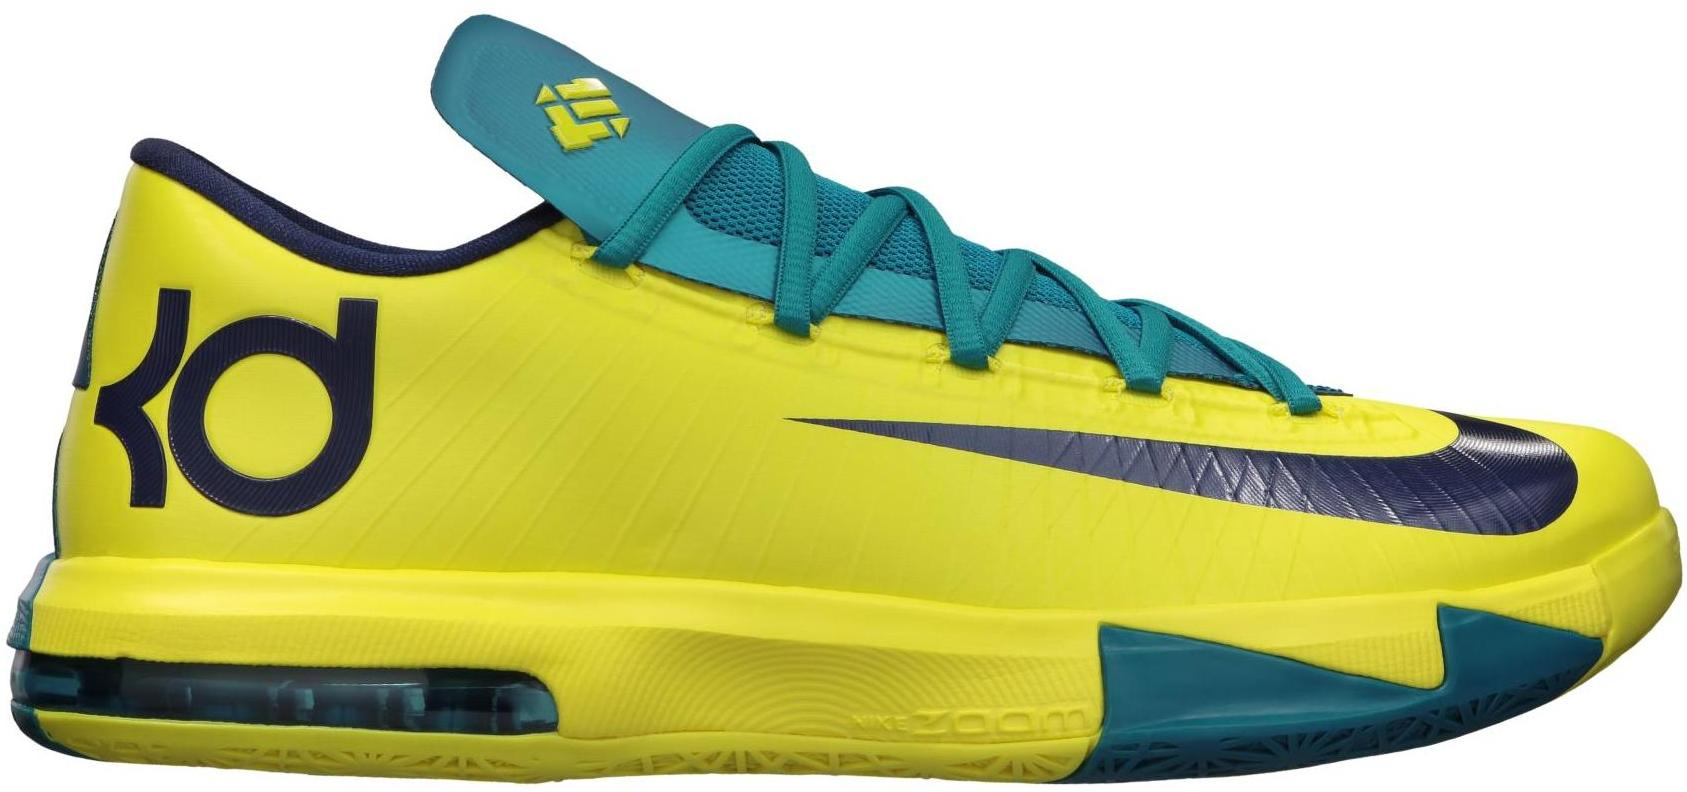 Nike KD 6 Seat Pleasant - 599424-700